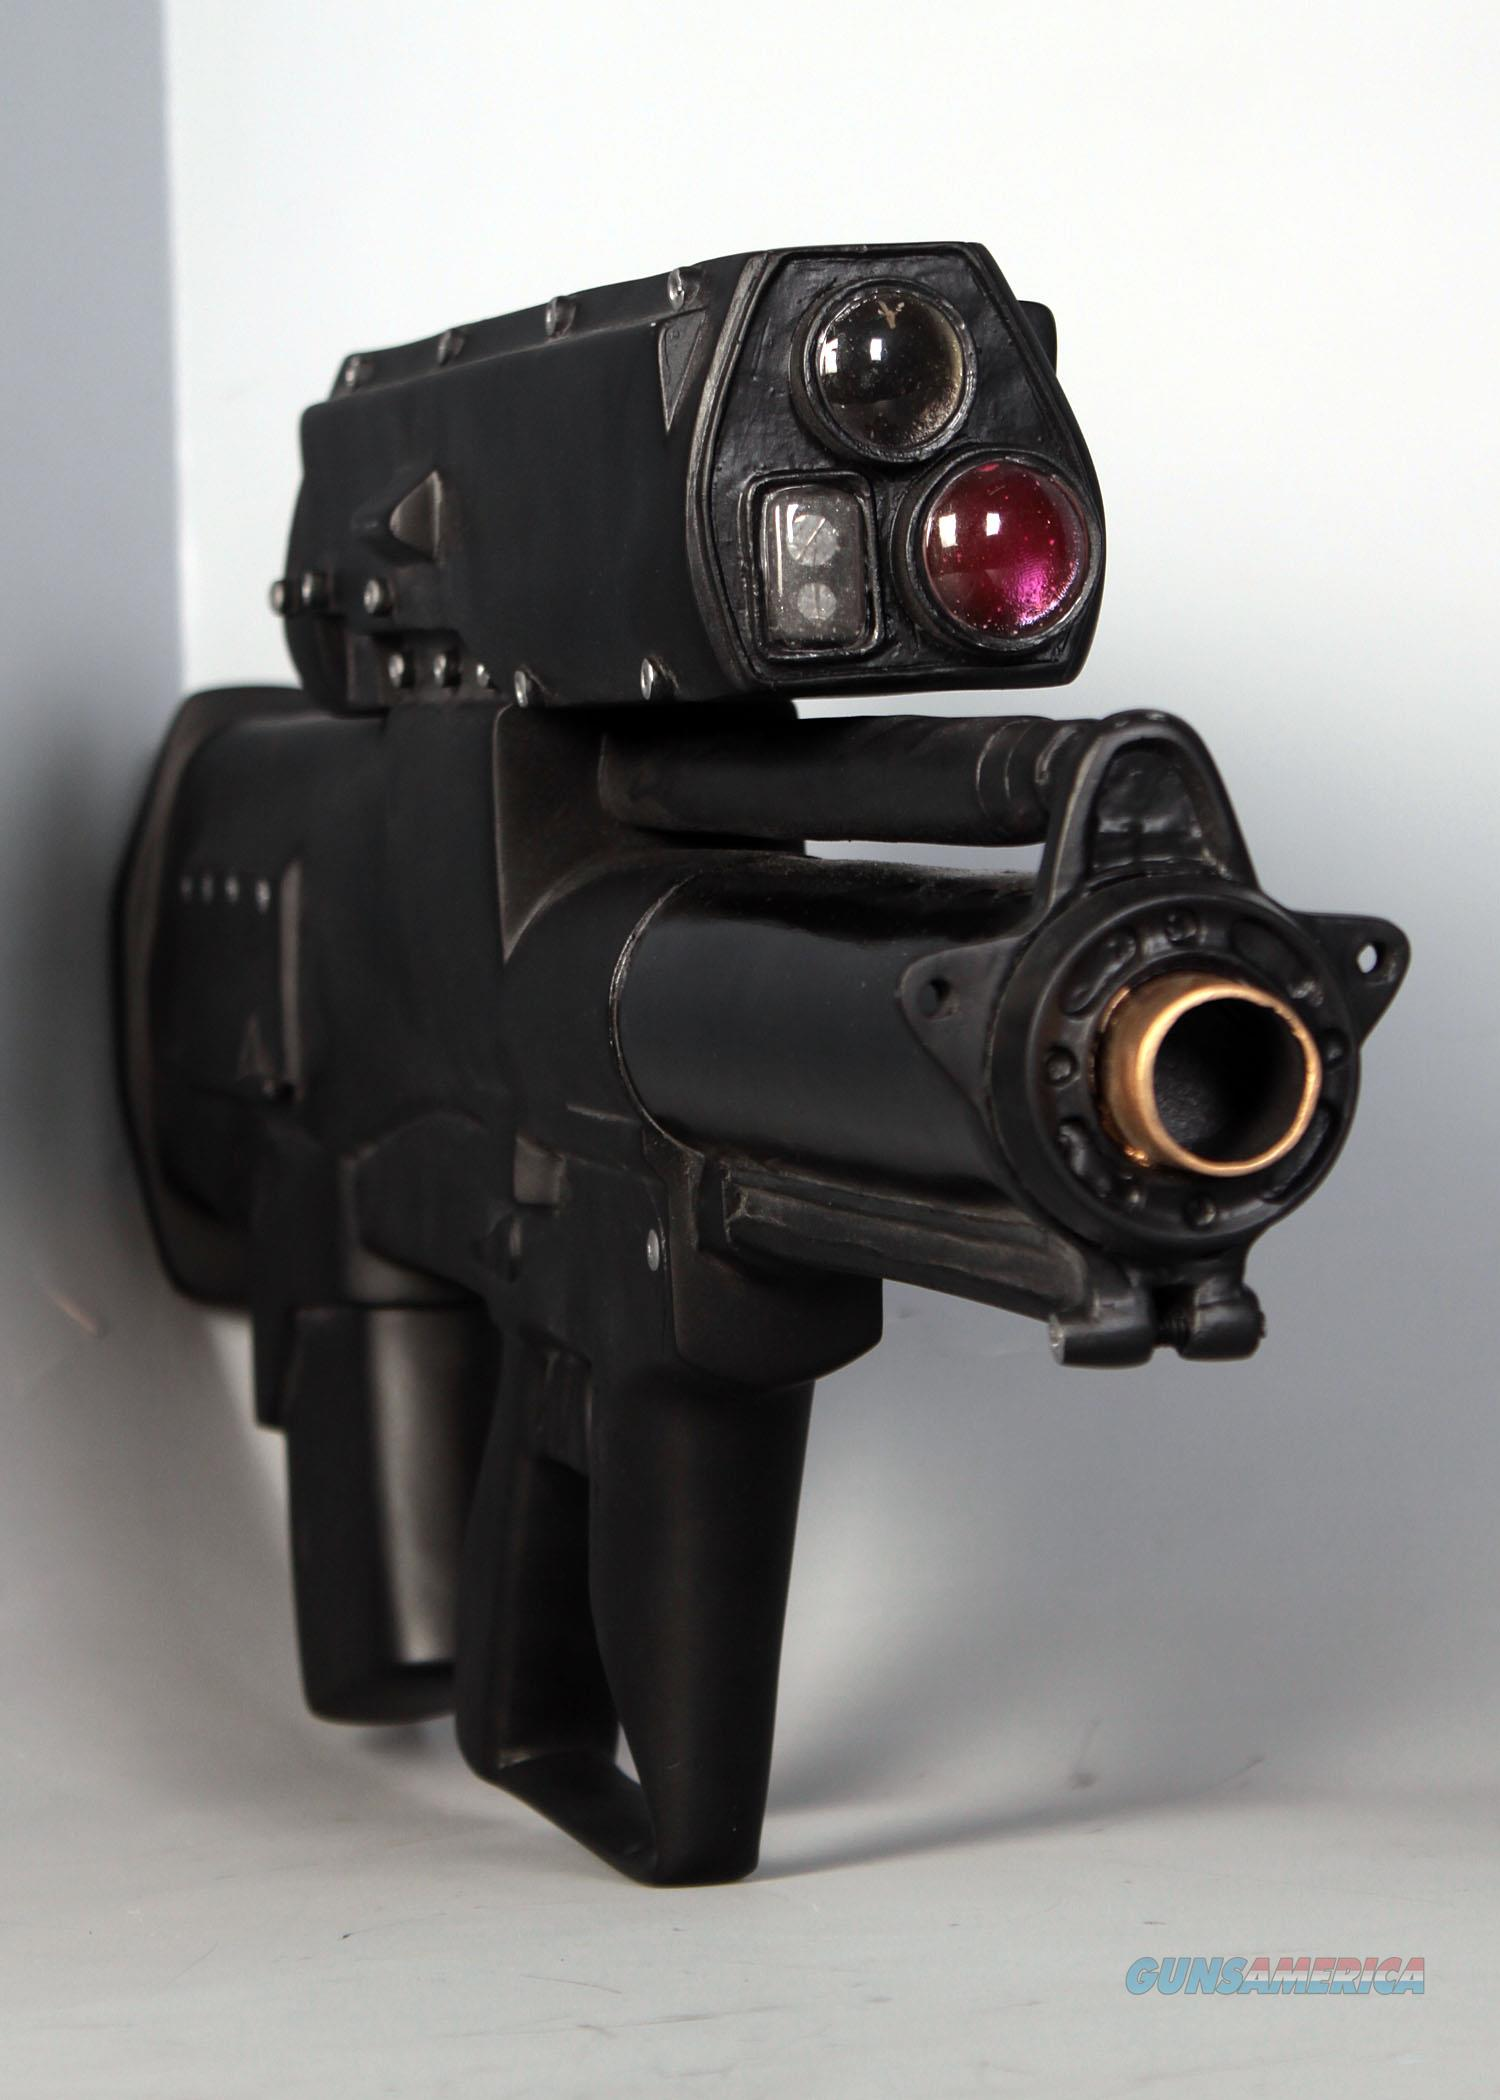 XM25 REPLICA SMART GUN  Guns > Rifles > Surplus Rifles & Copies